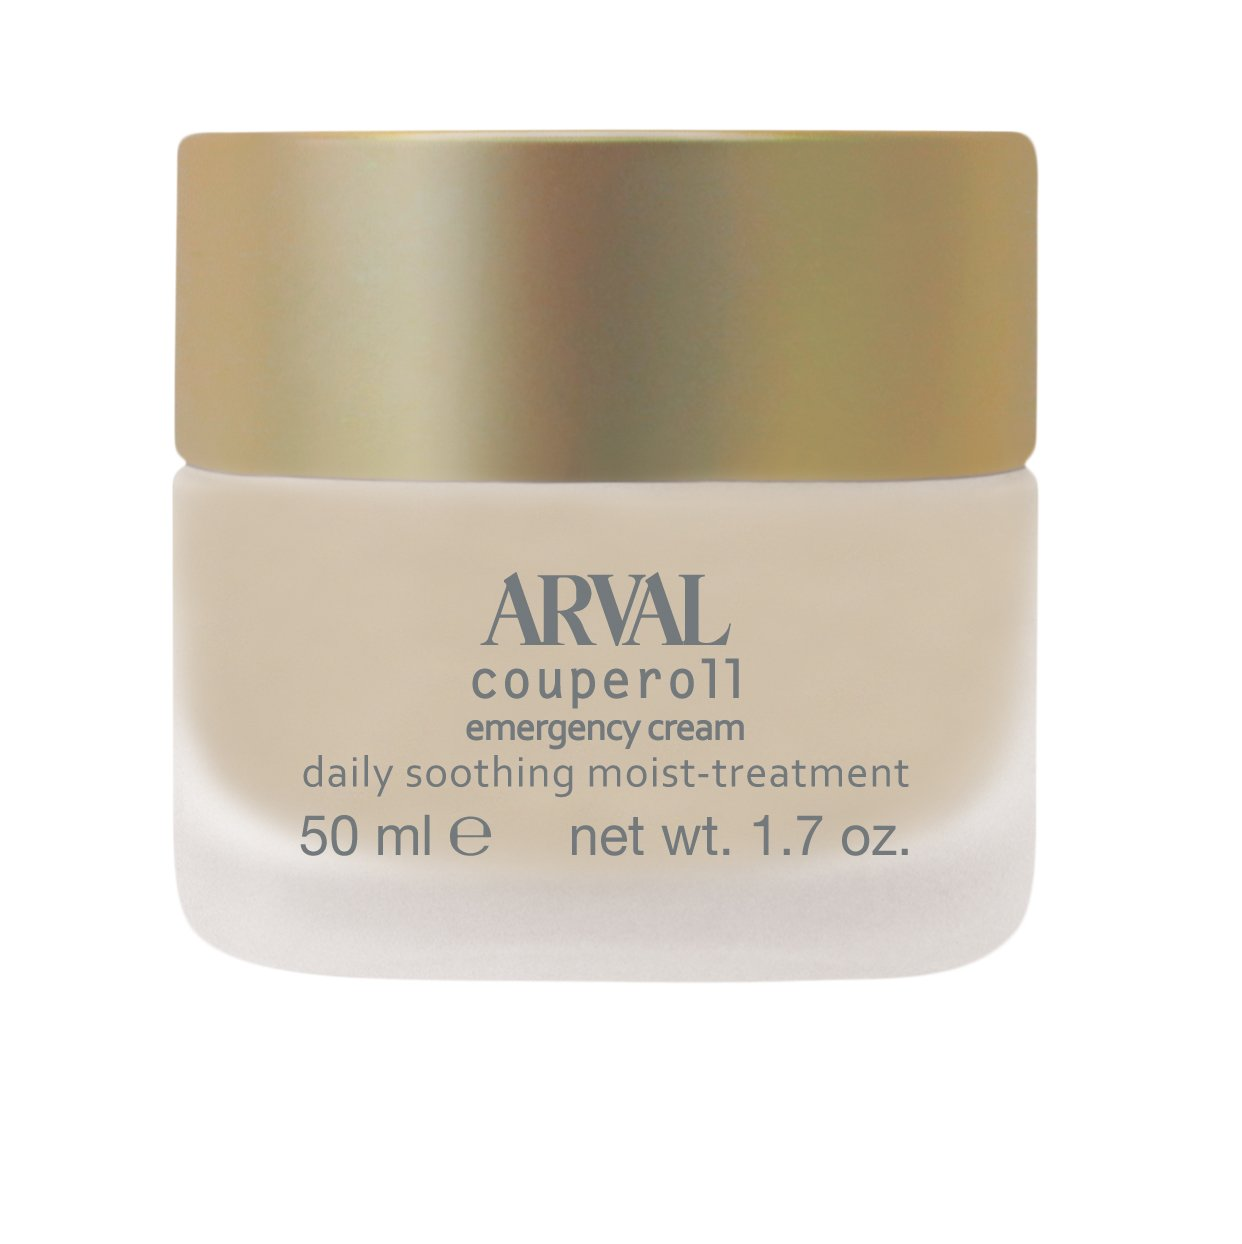 Arval Couperoll AC Complex Emergency Cream 50 ml crema 24 ore addolcente idratante Arval Srl 8025935240095 87120